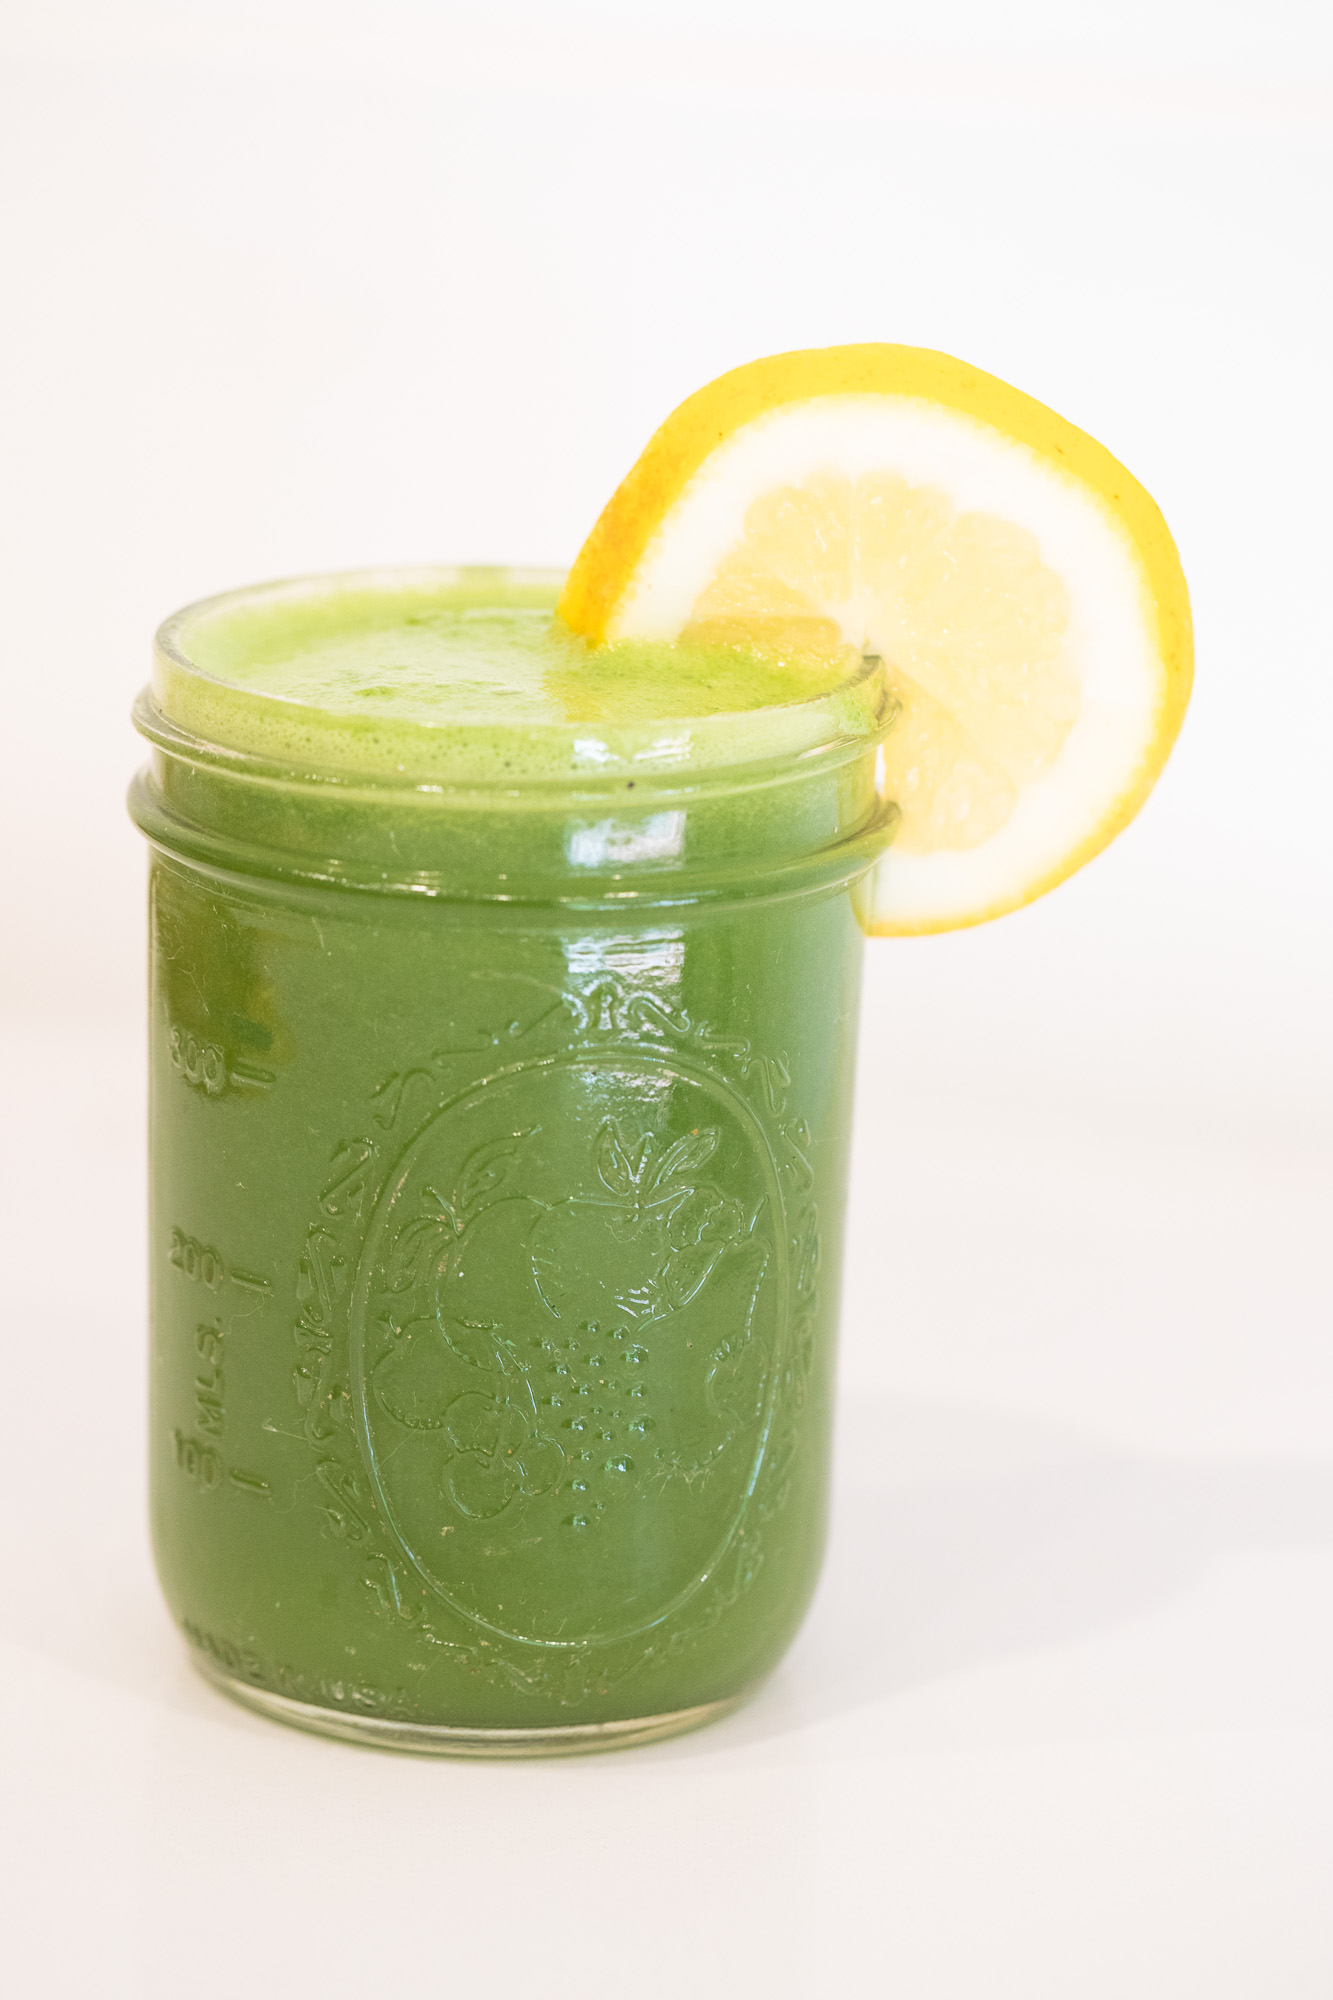 Maka-vegan-cafe-fresh-juice-2.jpg